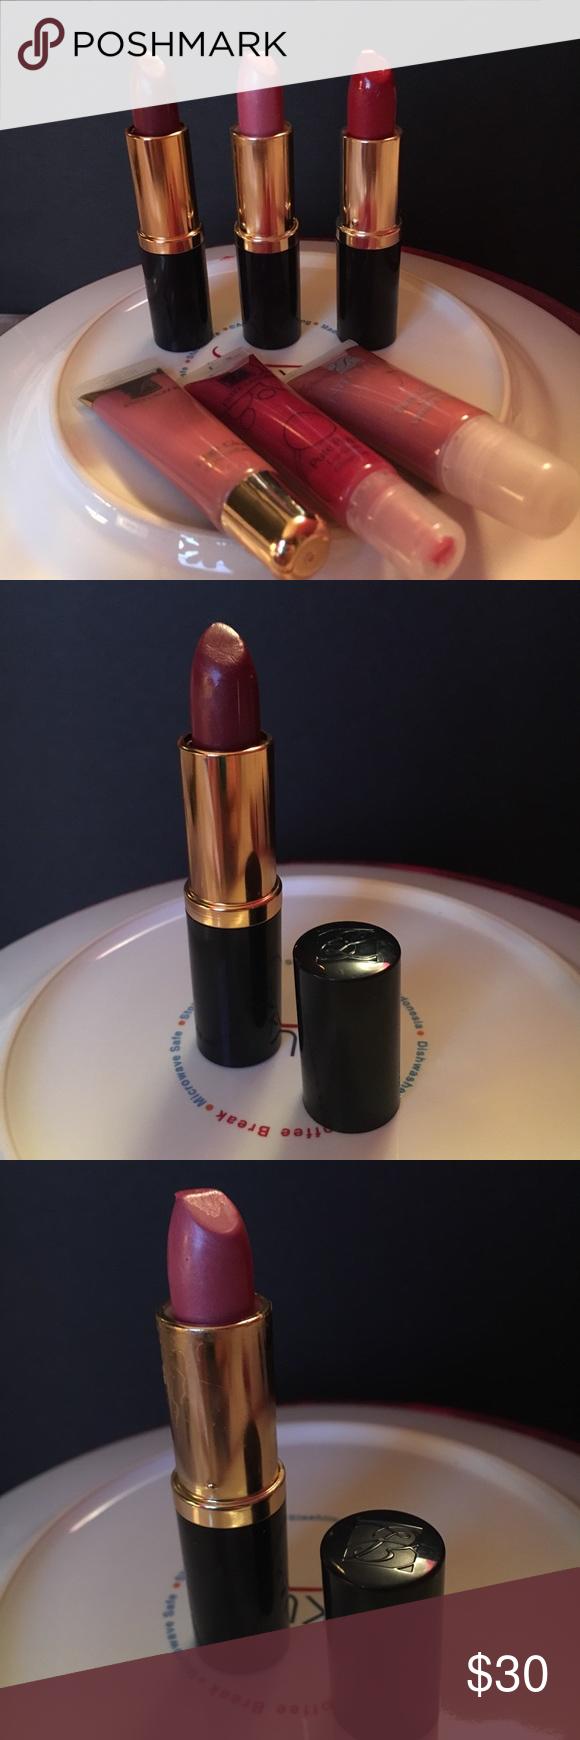 6 Estée Lauder Lipsticks/ Gloss Includes 3 Lipsticks (Fig